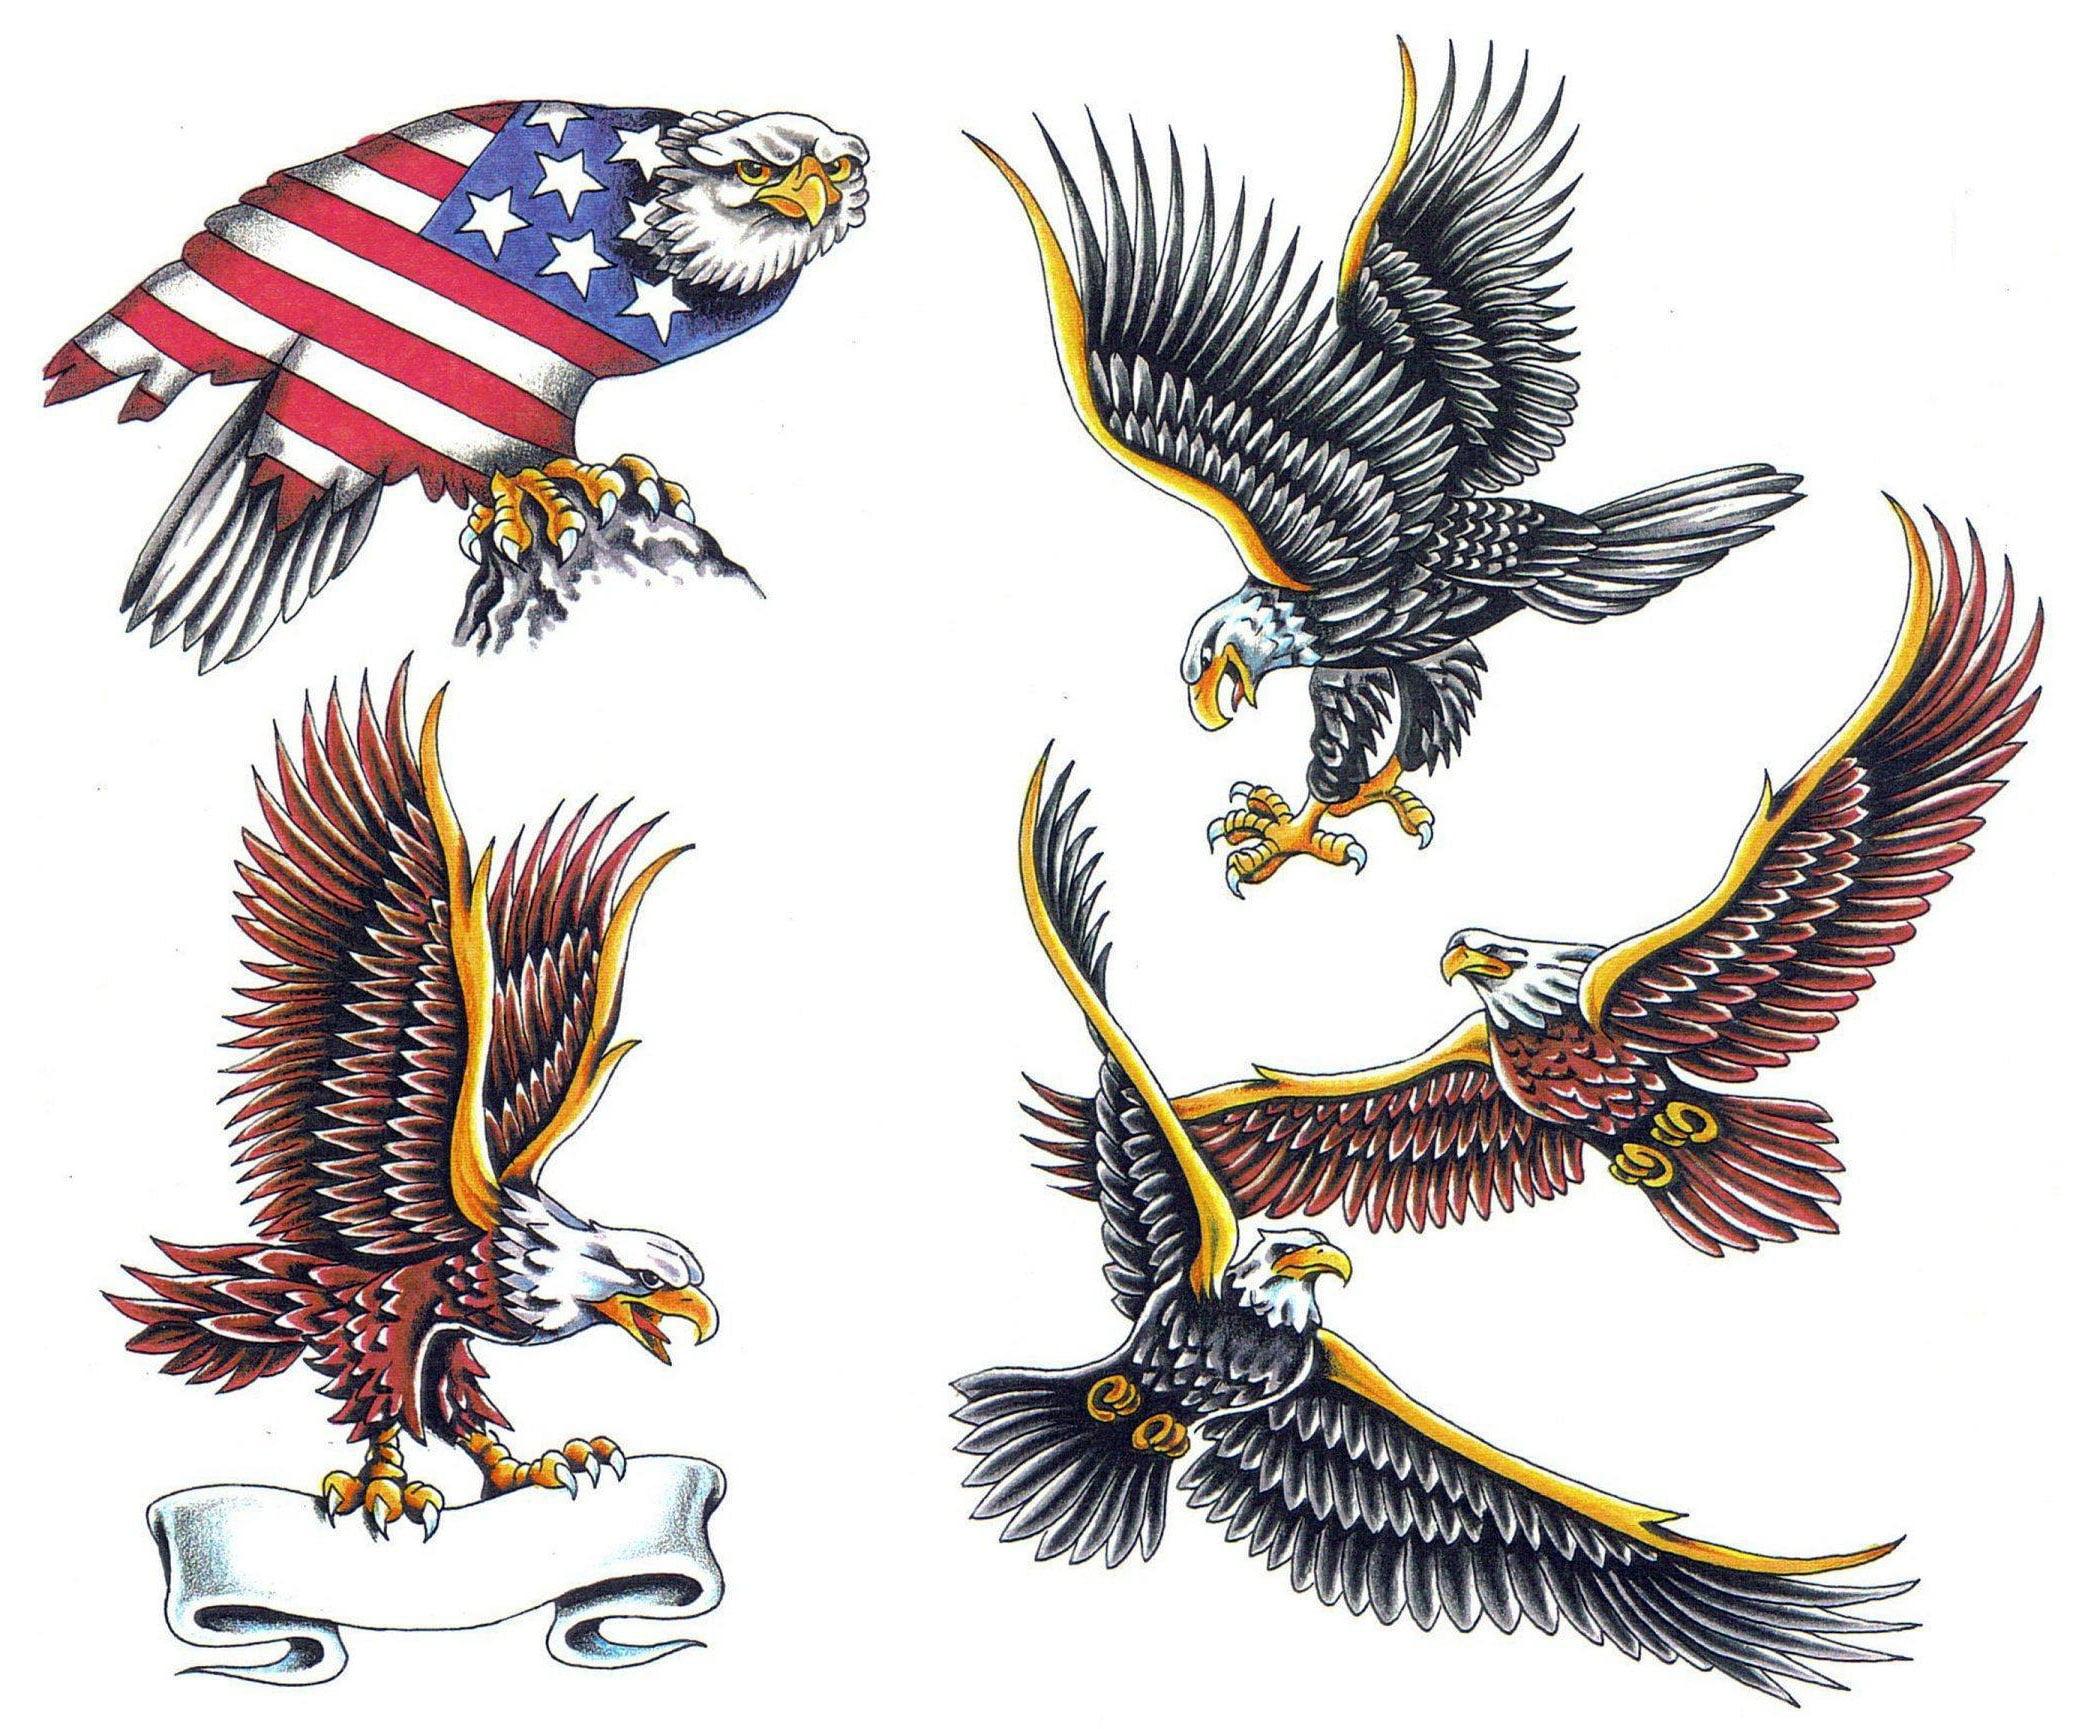 American eagle tattoos high quality photos and flash - Bald Eagle Tattoos Designs